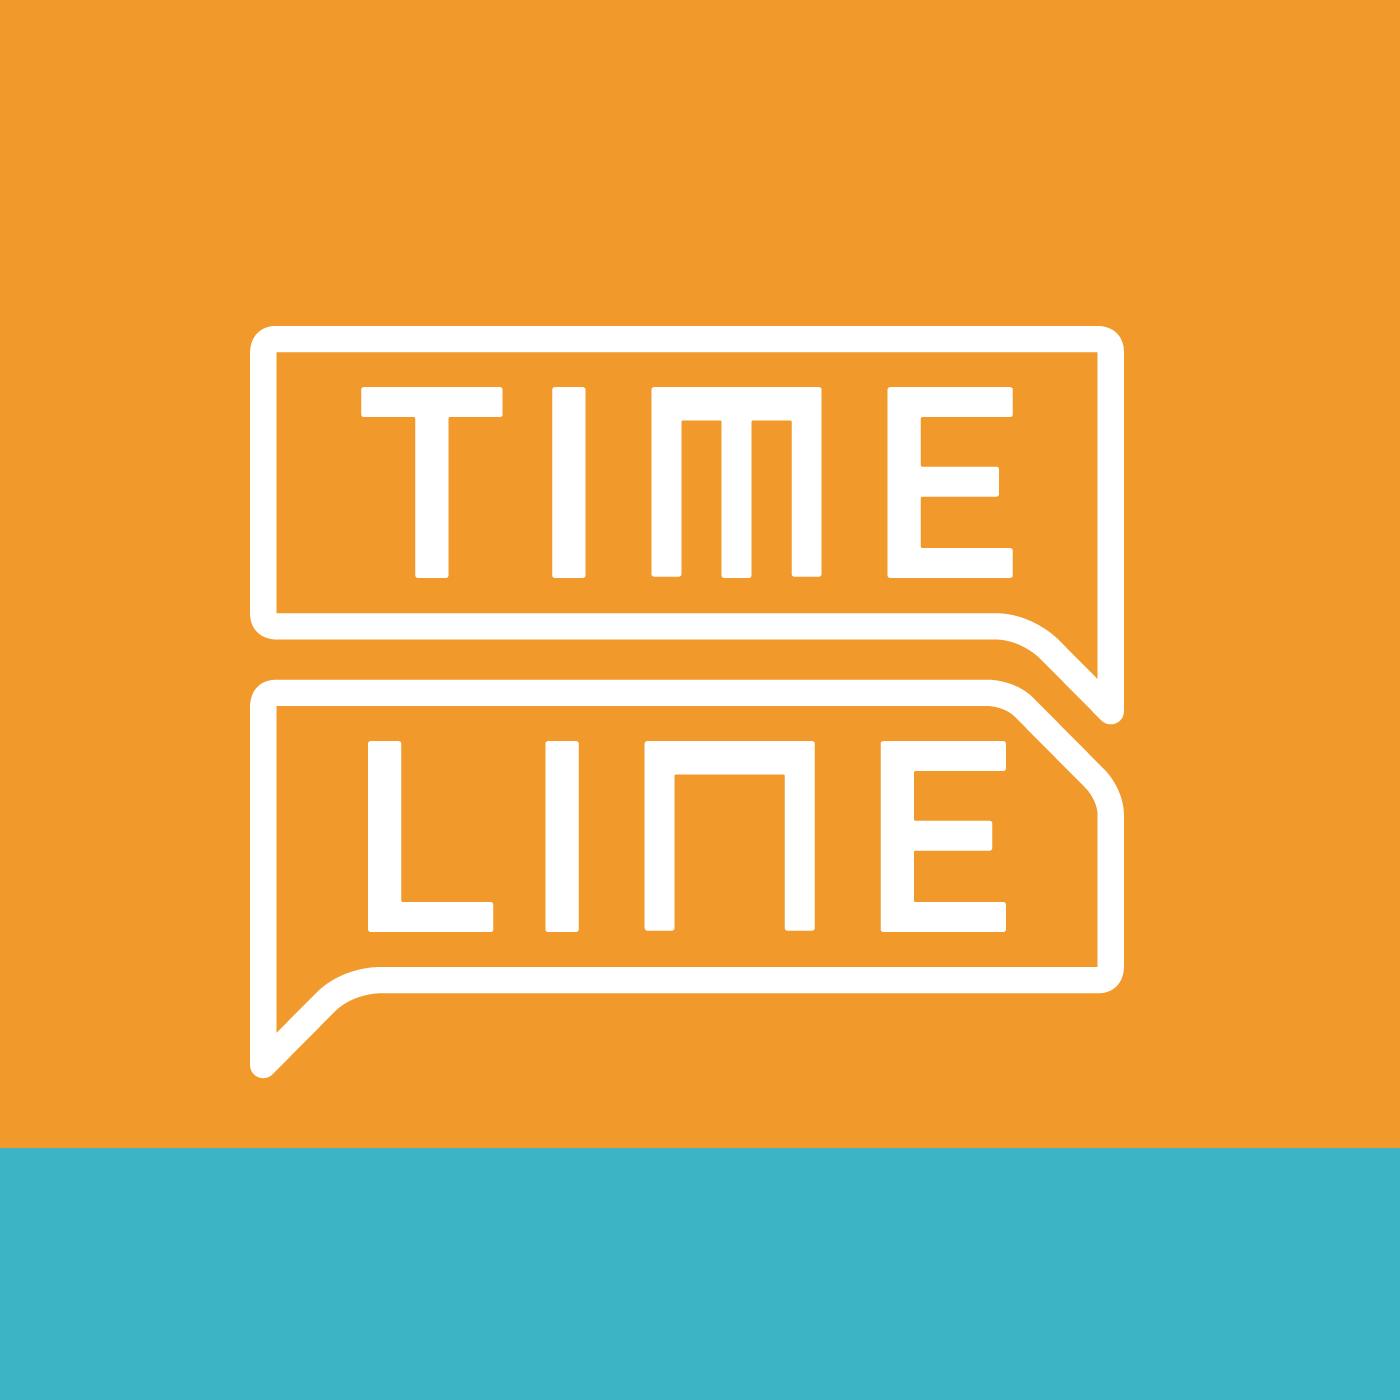 Timeline Gaúcha 15.03.2018